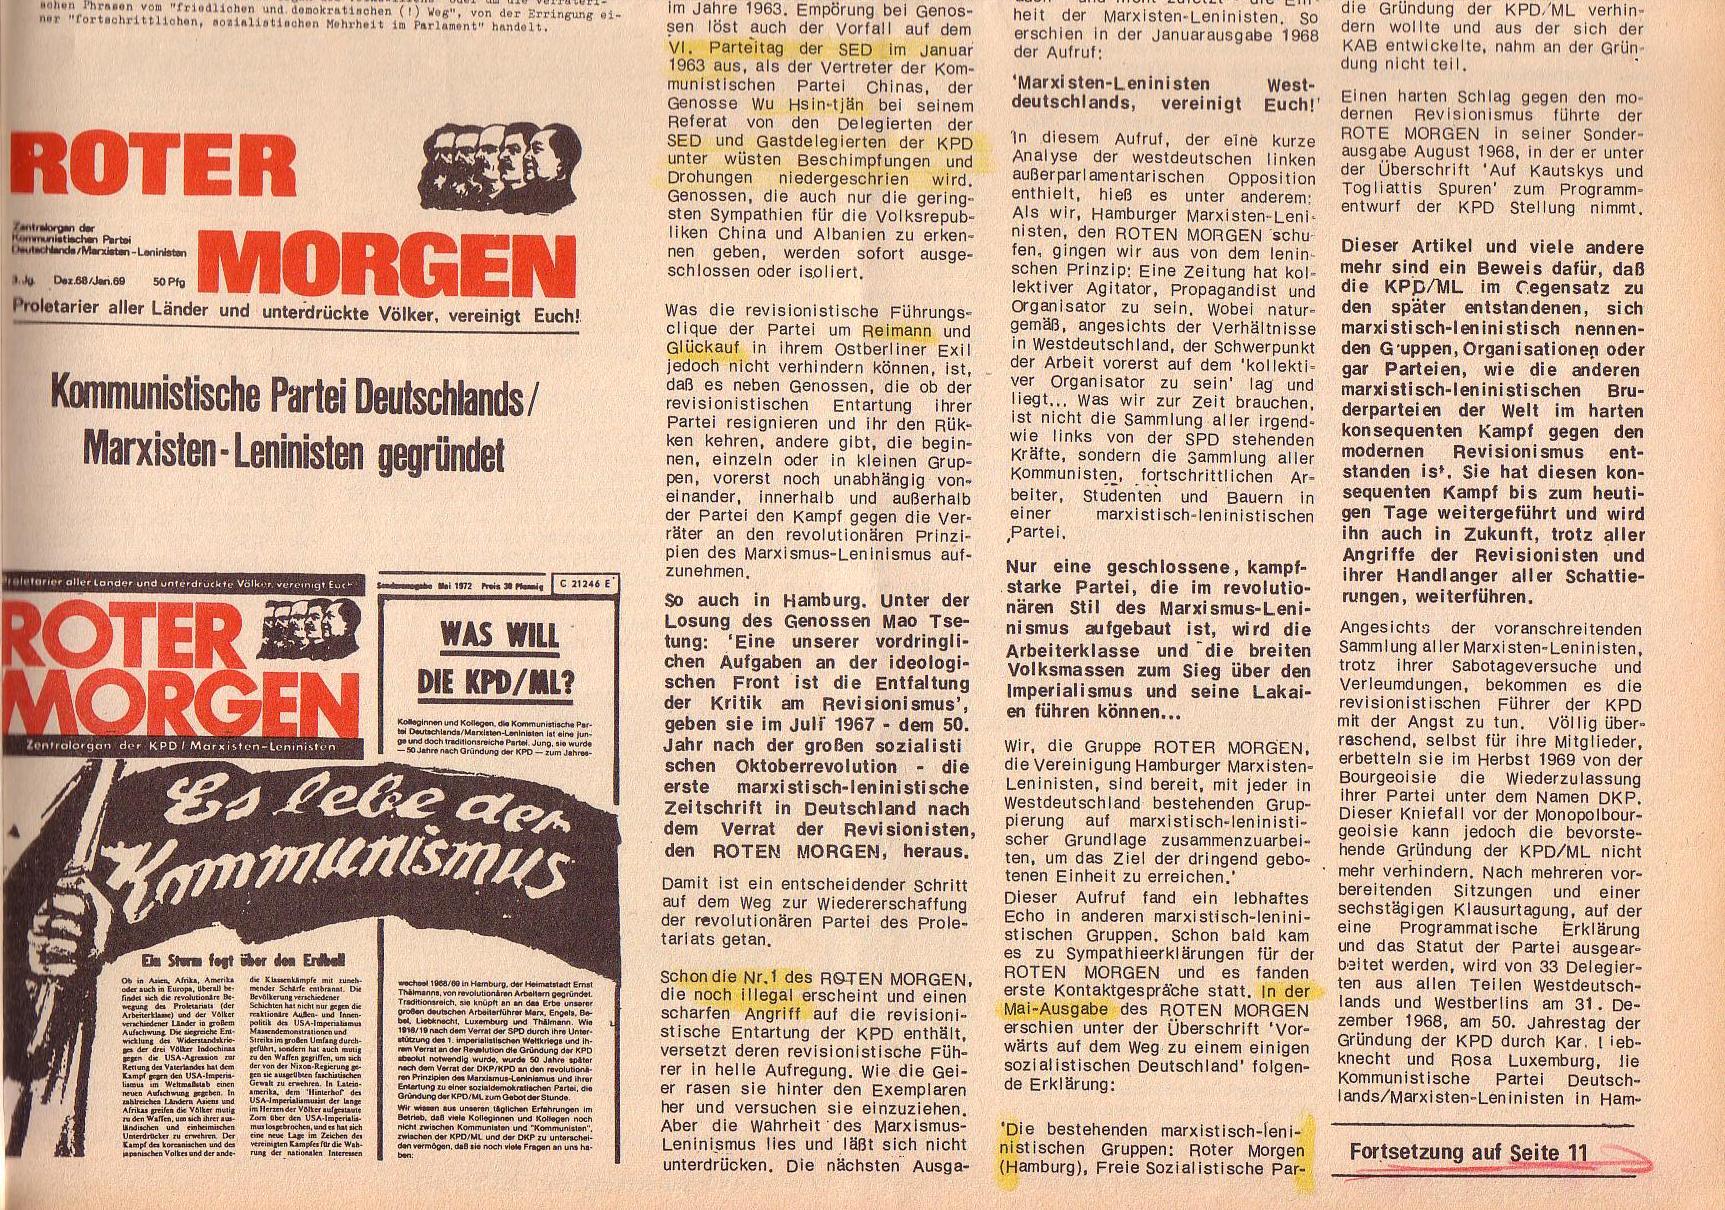 Roter Morgen, 6. Jg., 31. Juli 1972, Nr. 15, Seite 9b